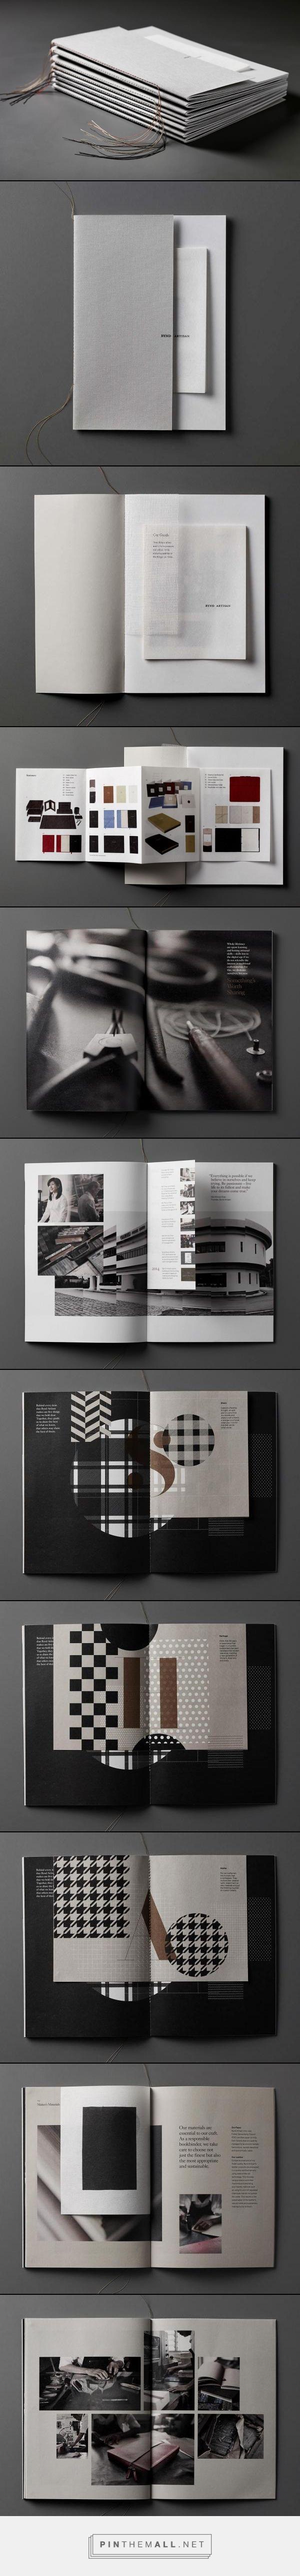 Byn Artisan Brochure by andlarry.com